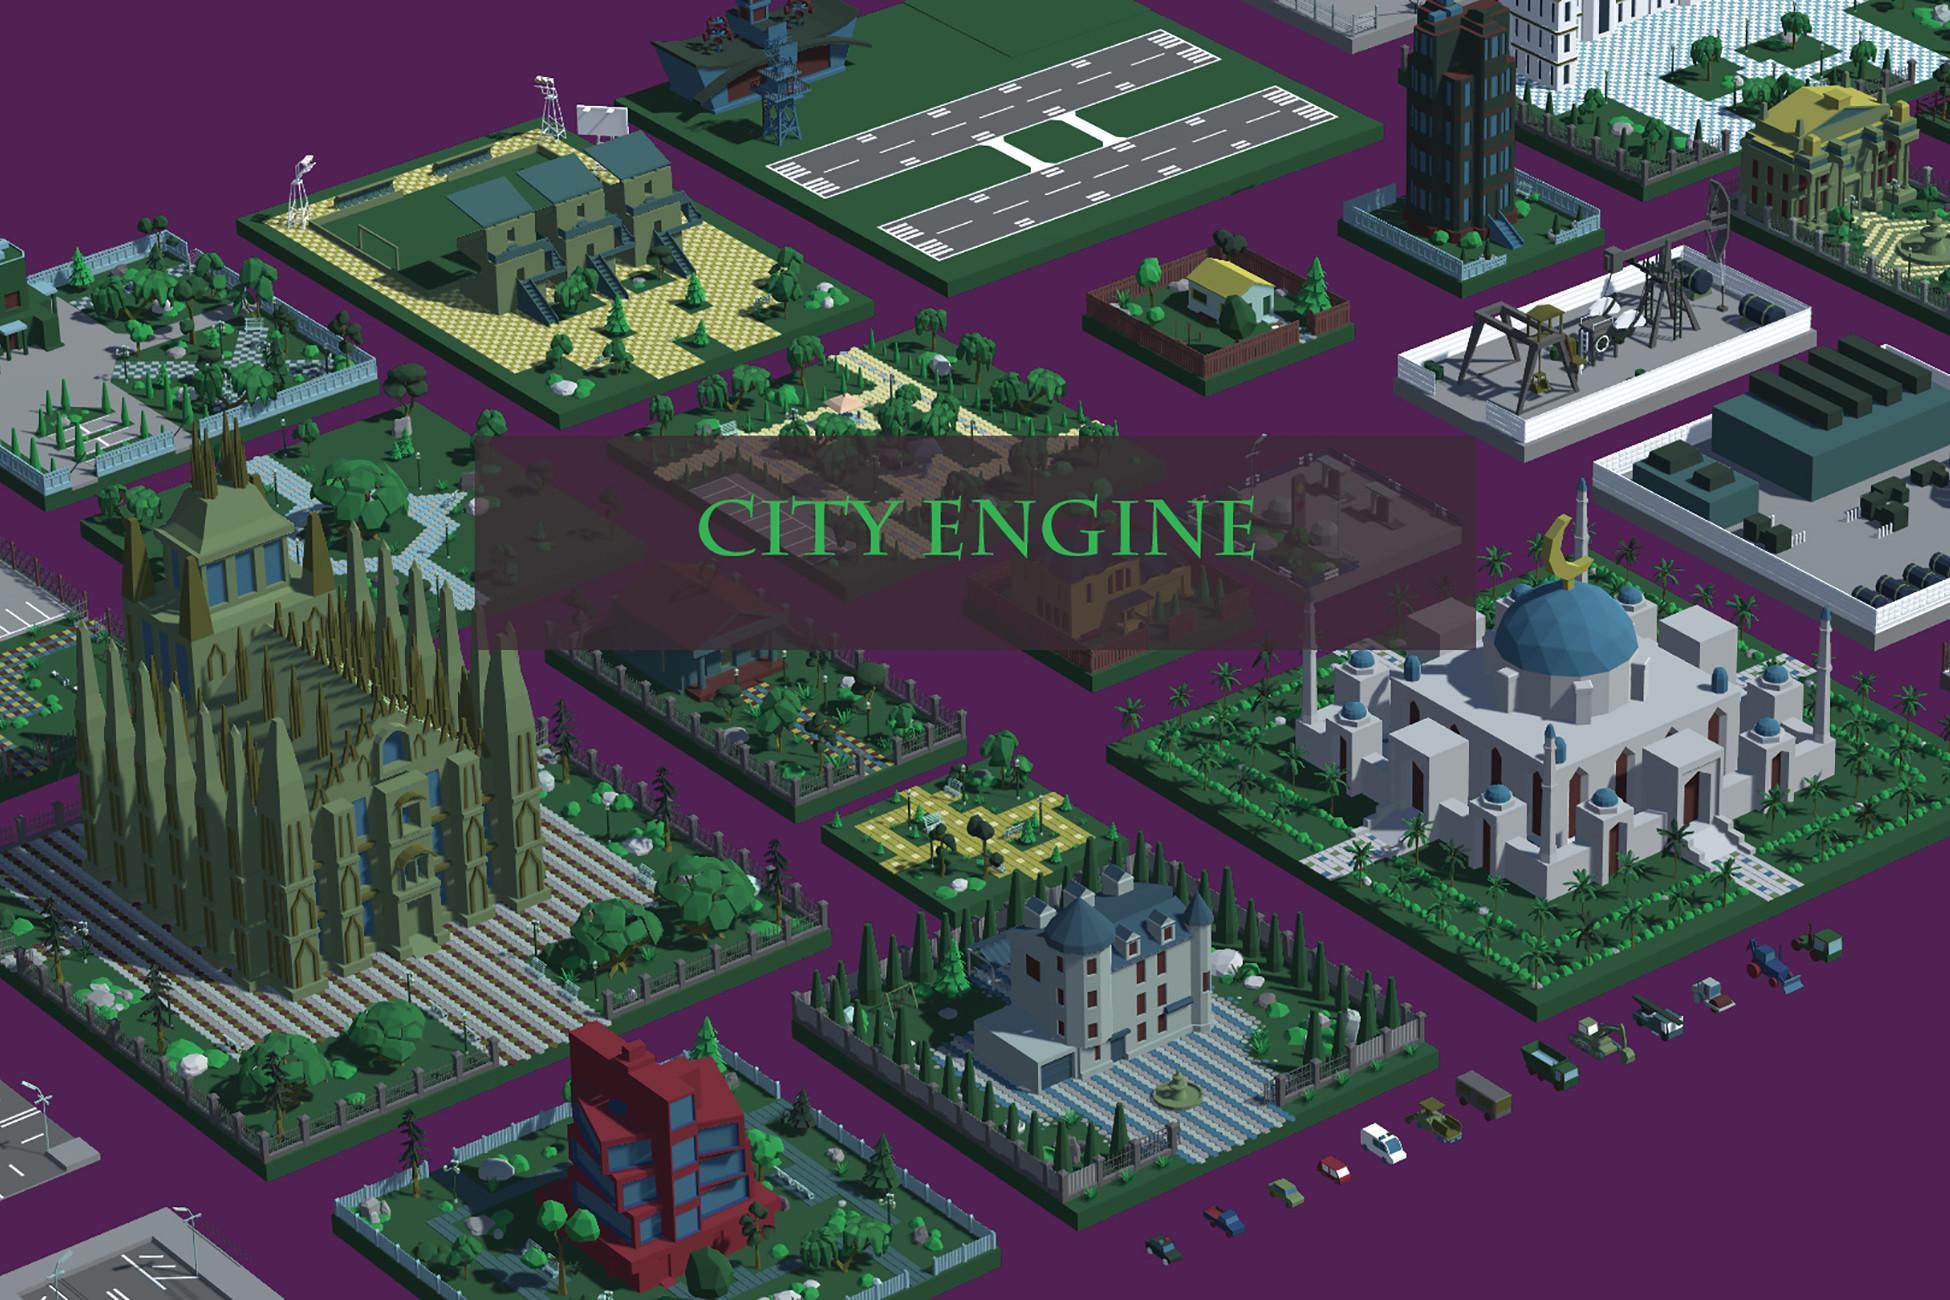 City Engine